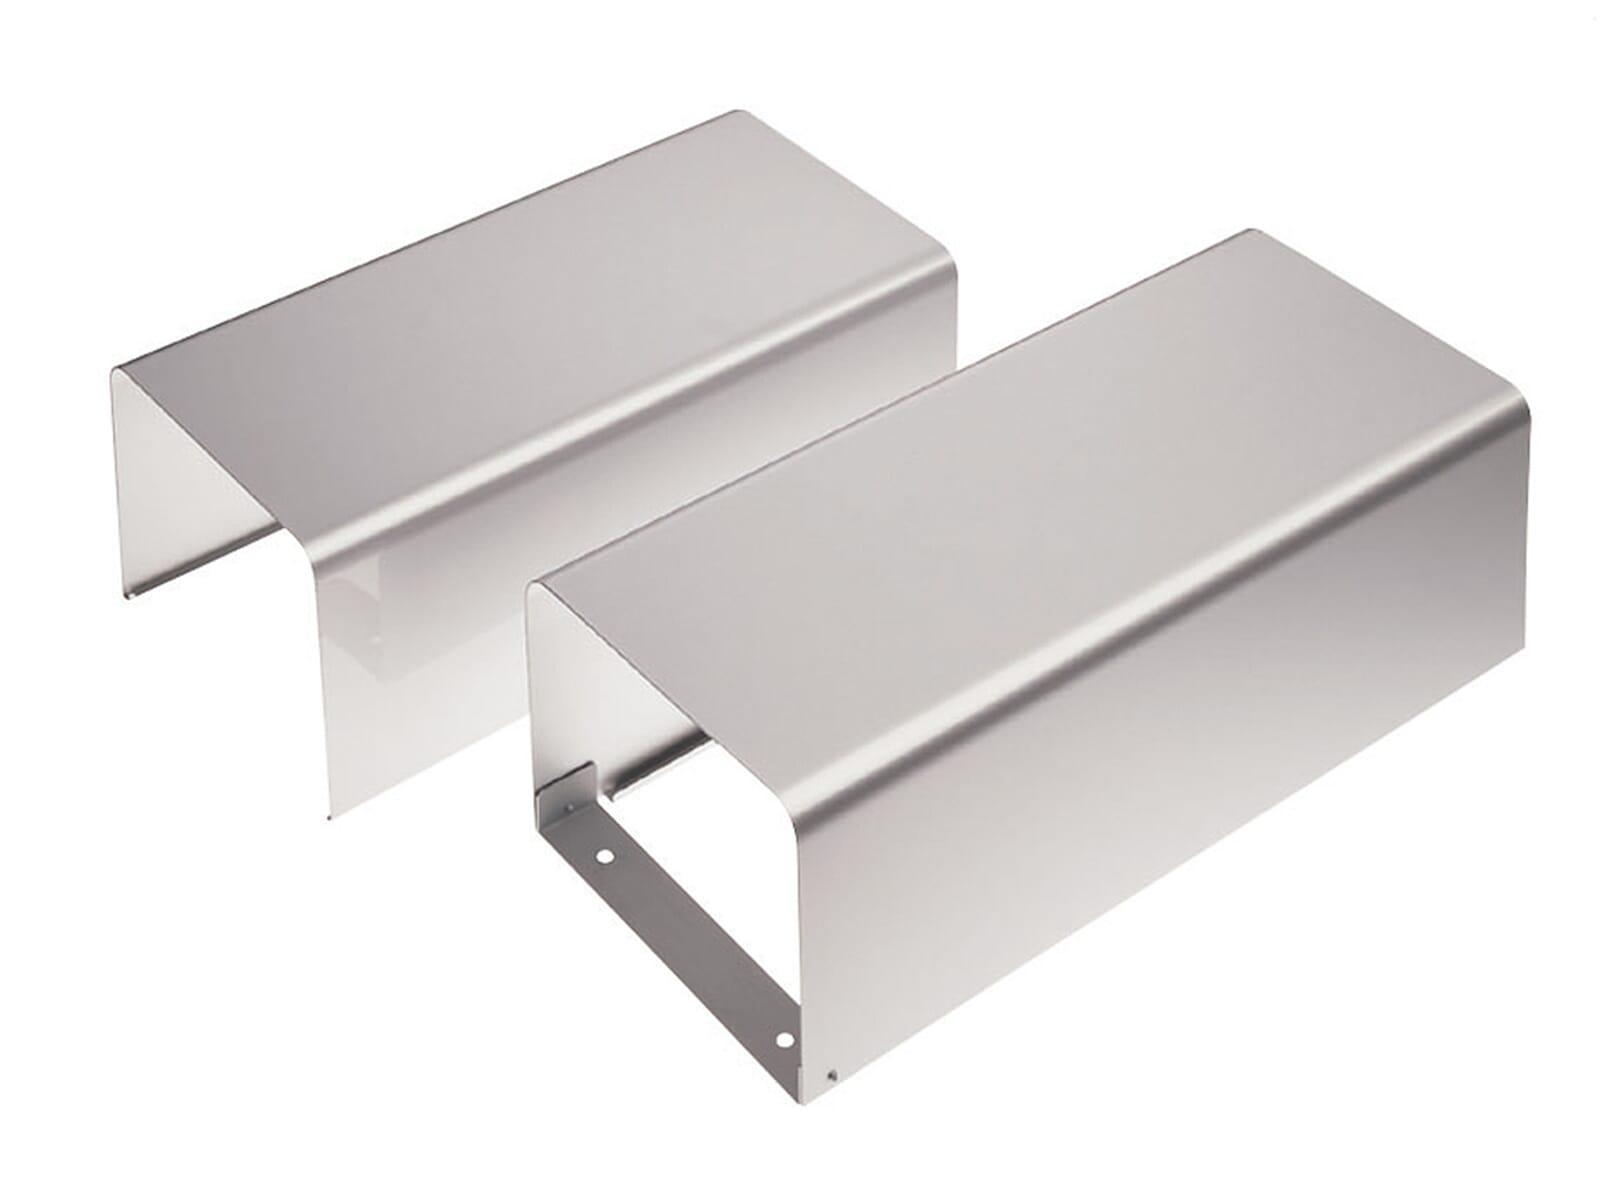 Produktabbildung AEG K1001-M Kaminaufsatz